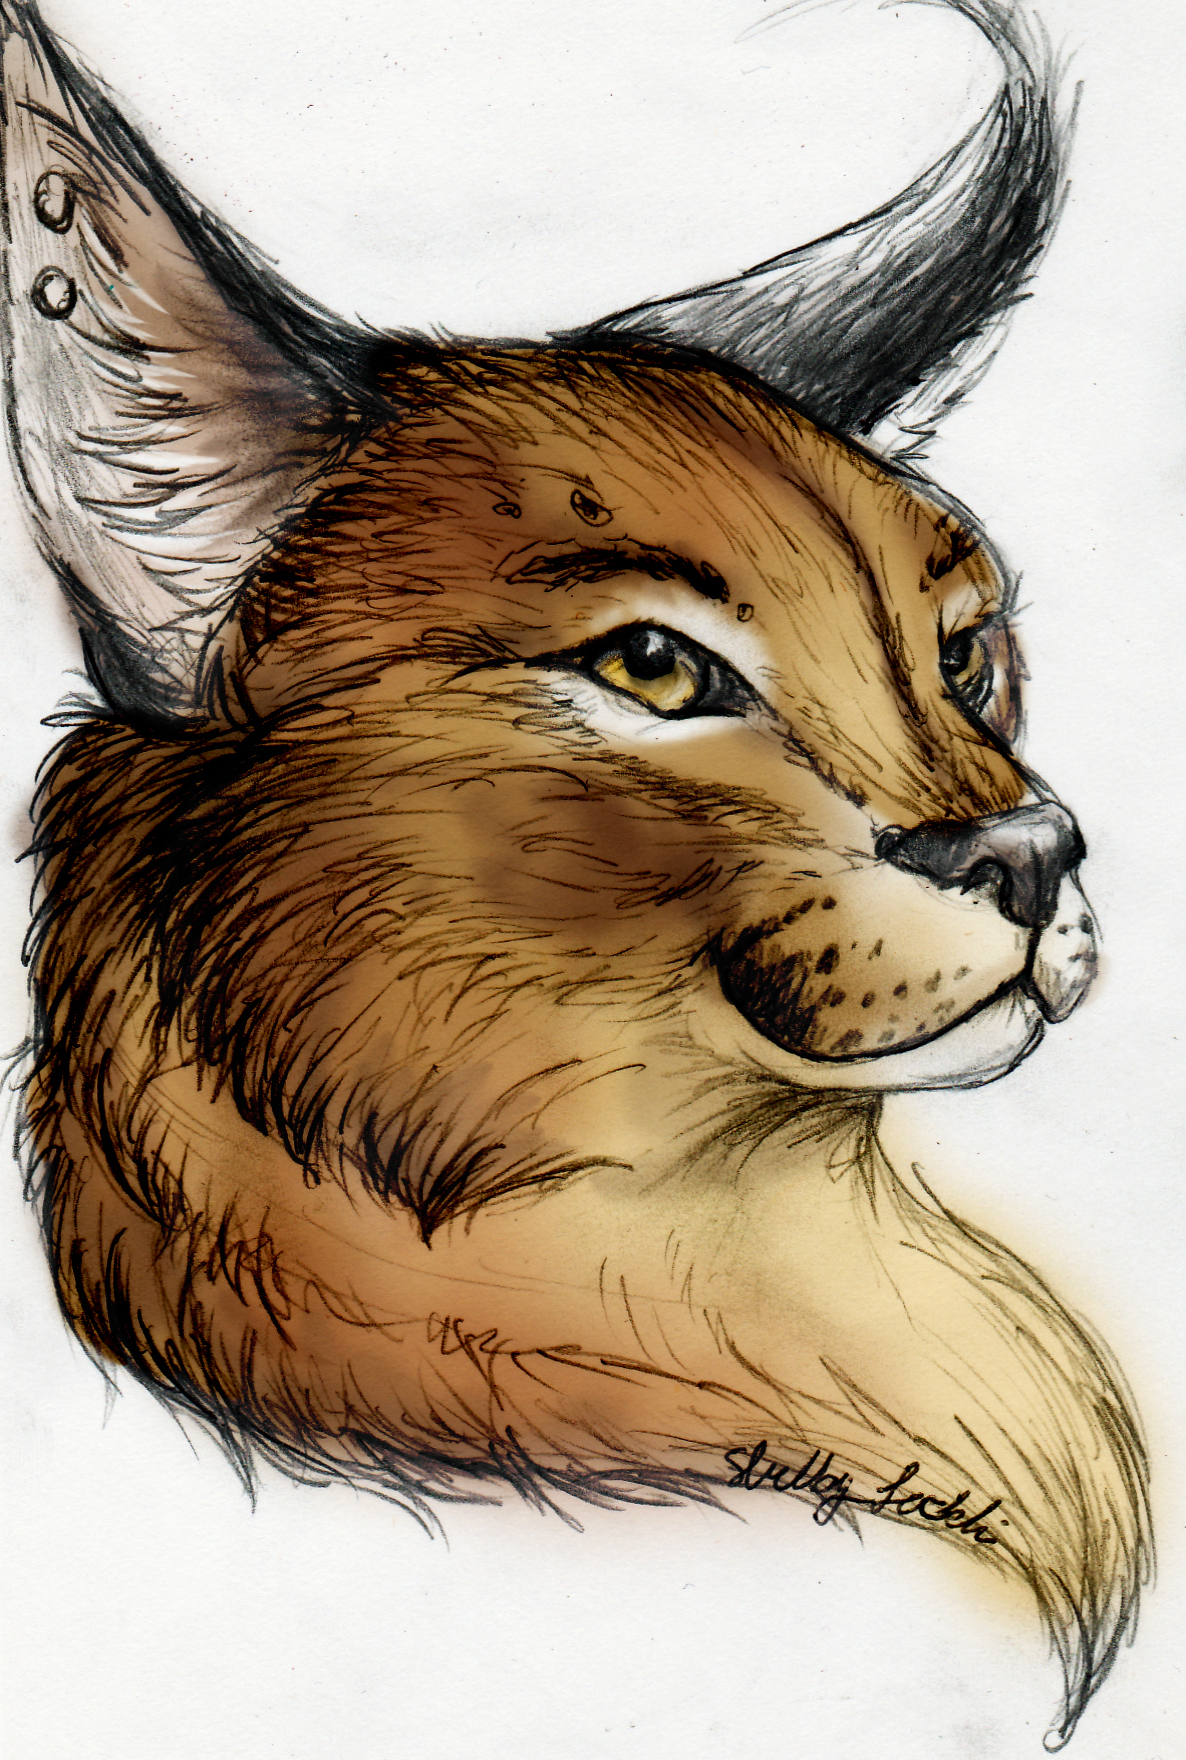 Aussie Kat's Fursona Avatar